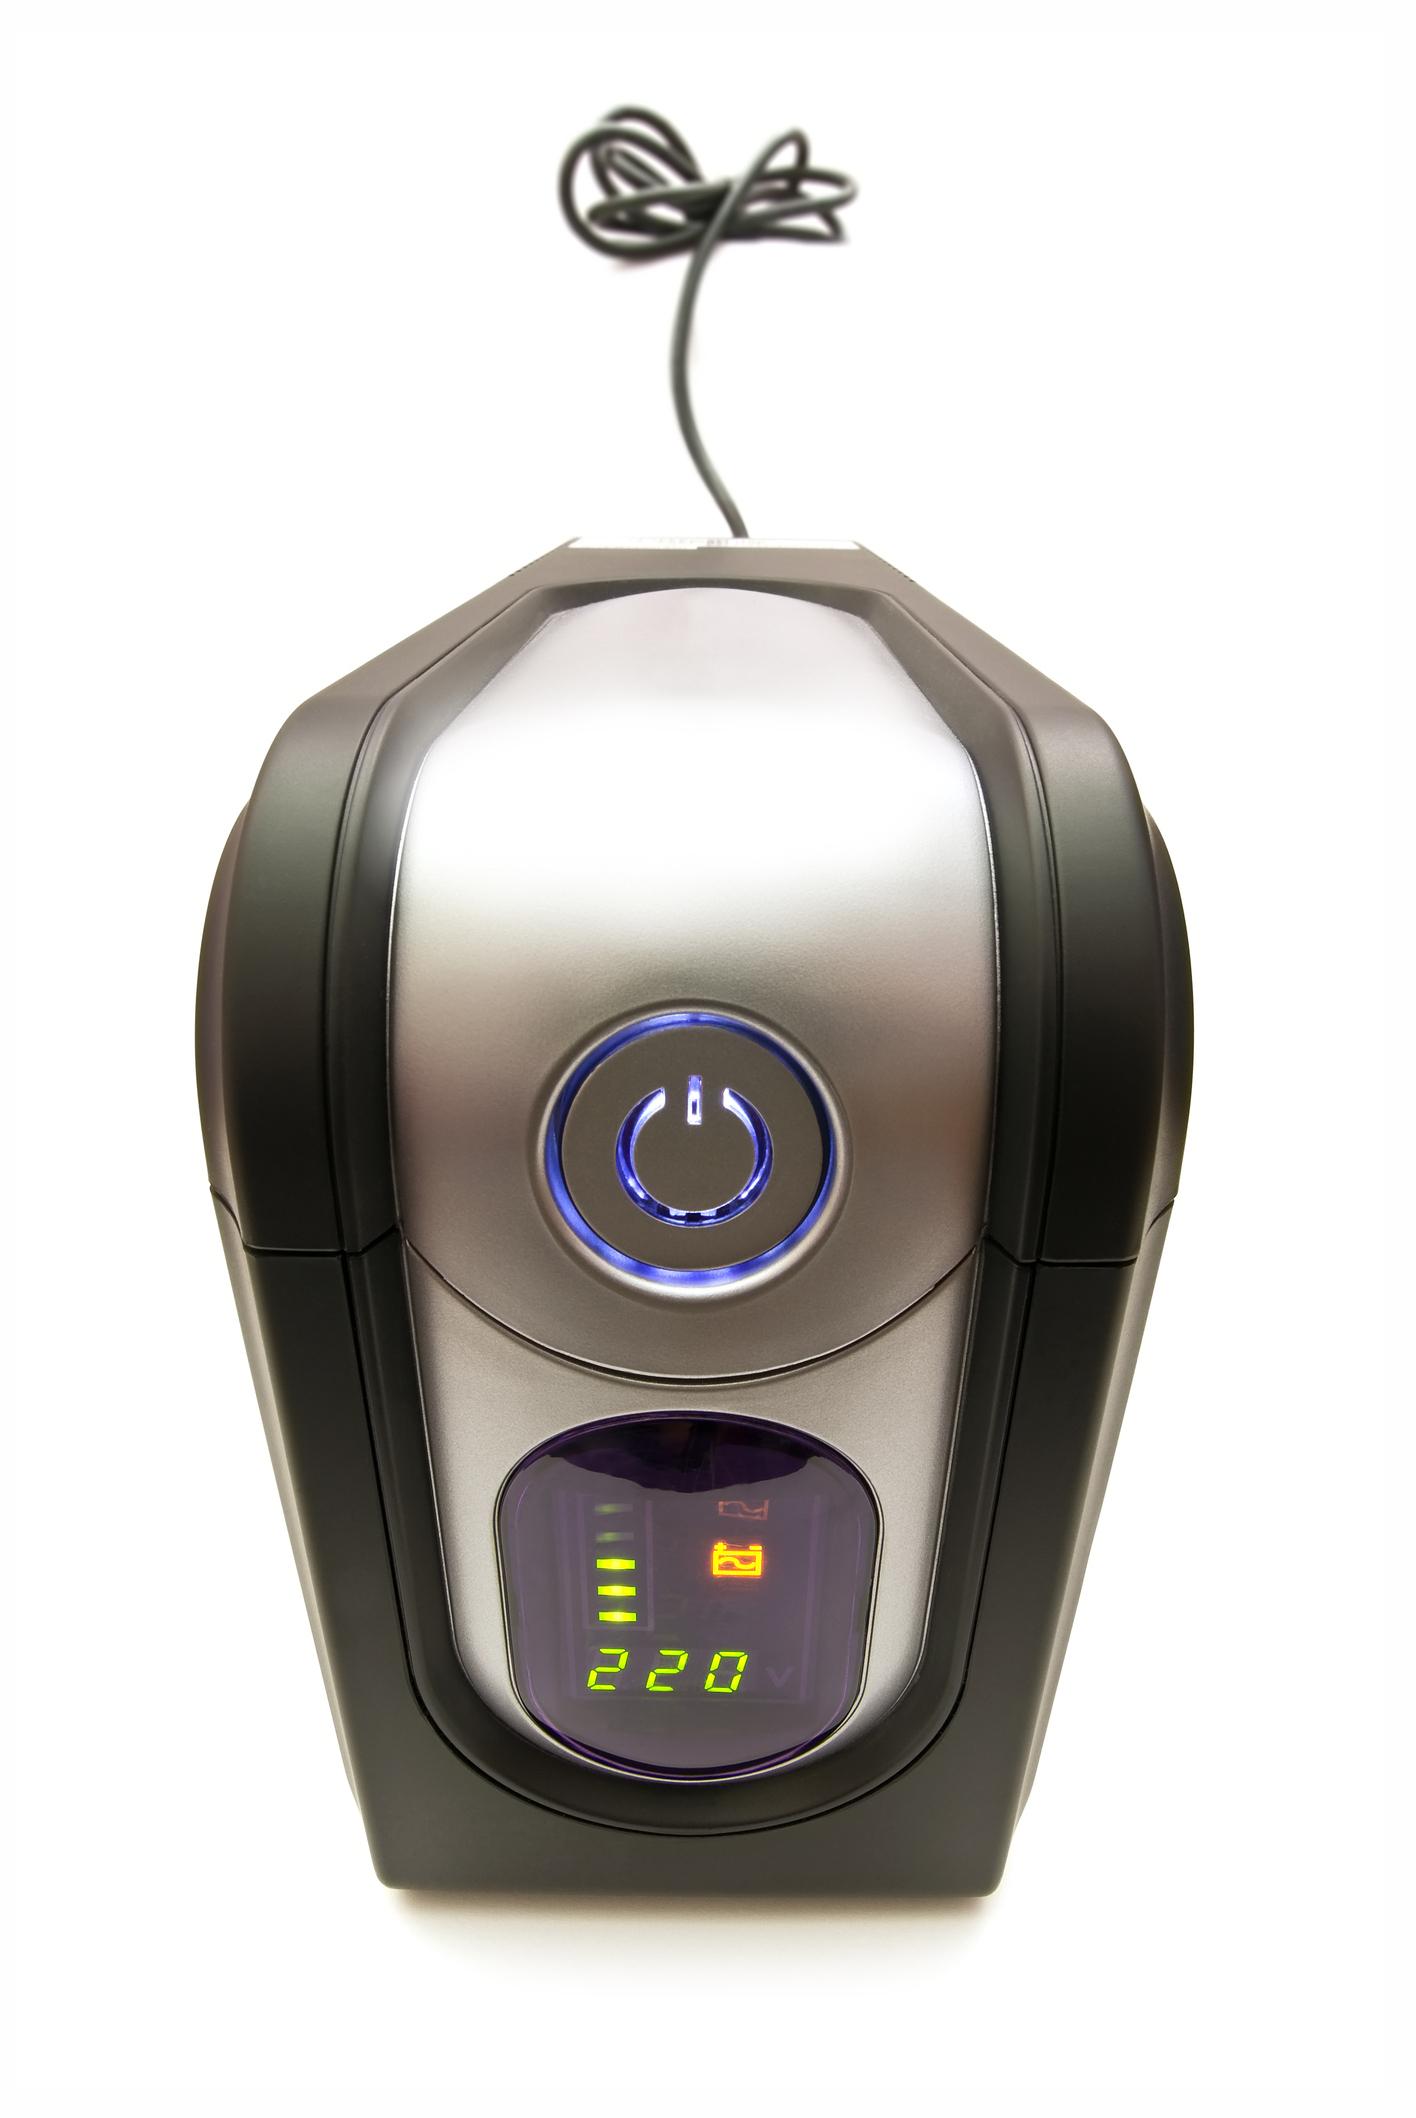 Generator Home Monitoring